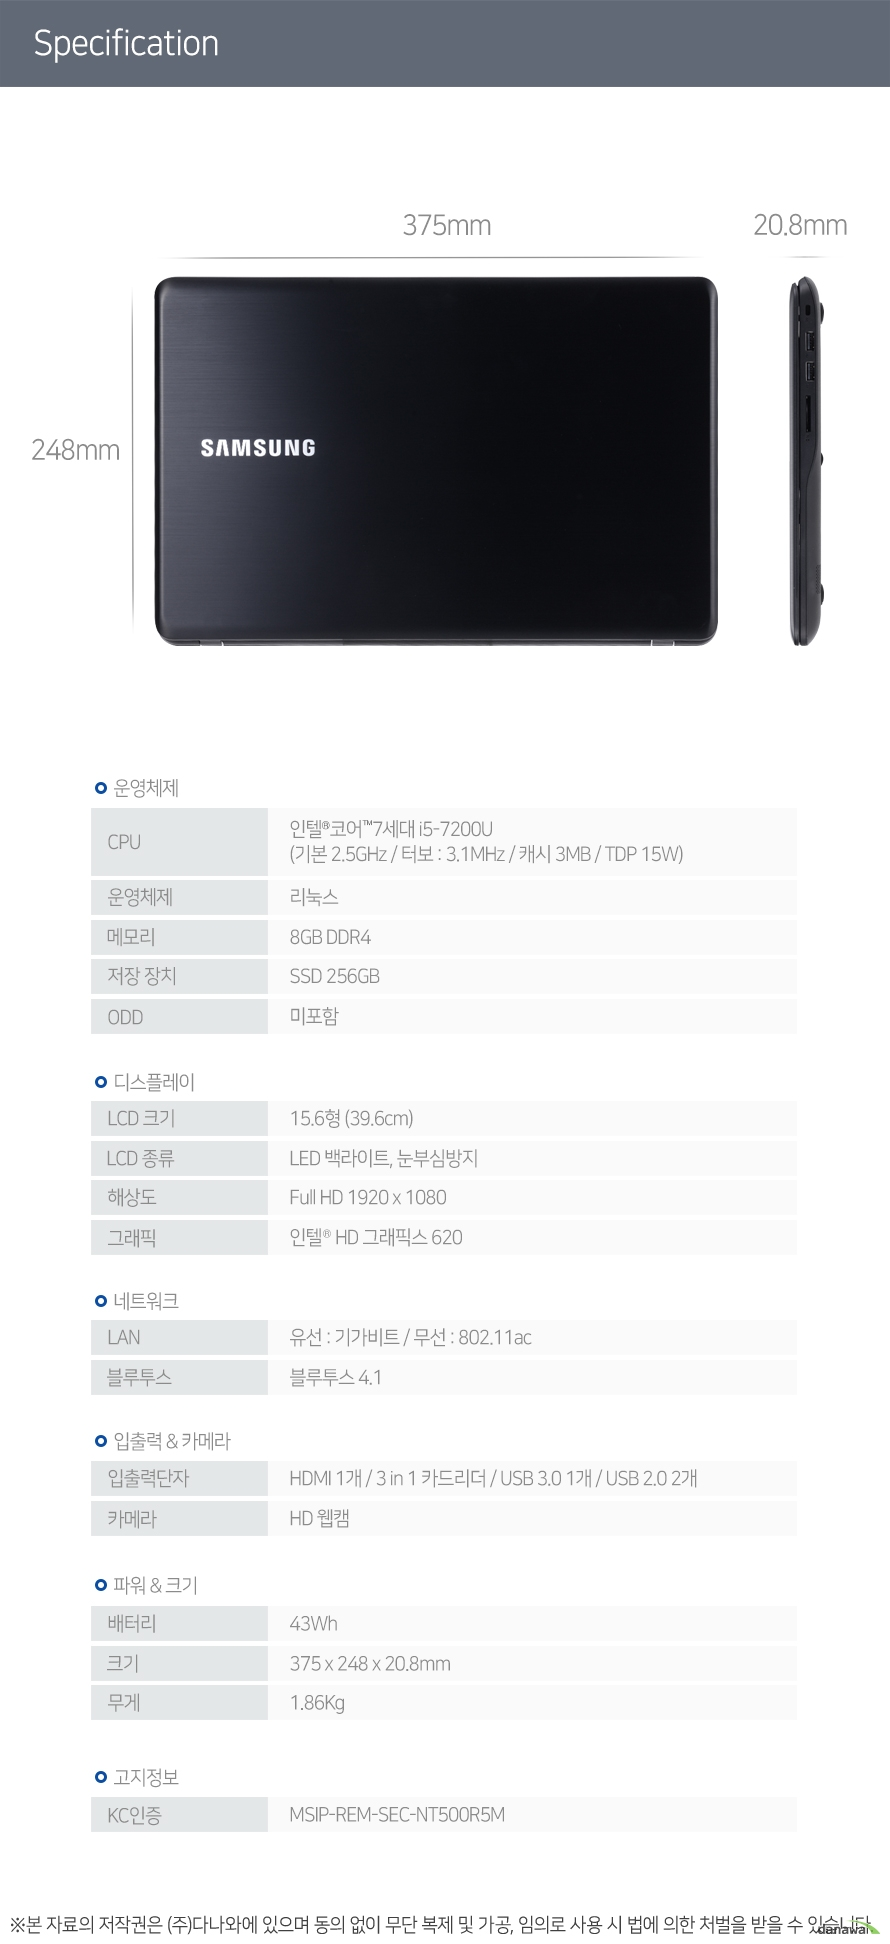 CPU 인텔 코어 7세대 i5-7200U (기본 2.5GHz / 터보 : 3.1MHz / 캐시 3MB / TDP 15W) 운영체제 리눅스 메모리 8GB DDR4 저장 장치 SSD 256GB ODD 미포함 LCD 크기 15.6형 (39.6cm) LCD 종류 LED 백라이트, 눈부심방지 해상도 Full HD 1920 x 1080 그래픽 인텔 HD 그래픽스 620 LAN 유선 : 기가비트 / 무선 : 802.11ac 블루투스 블루투스 4.1 입출력단자 HDMI 1개 / 3 in 1 카드리더 / USB 3.0 1개 / USB 2.0 2개 카메라 HD 웹캠 배터리 43Wh 크기 375 x 248 x 20.8mm 무게 1.86Kg KC인증 MSIP-REM-SEC-NT500R5M